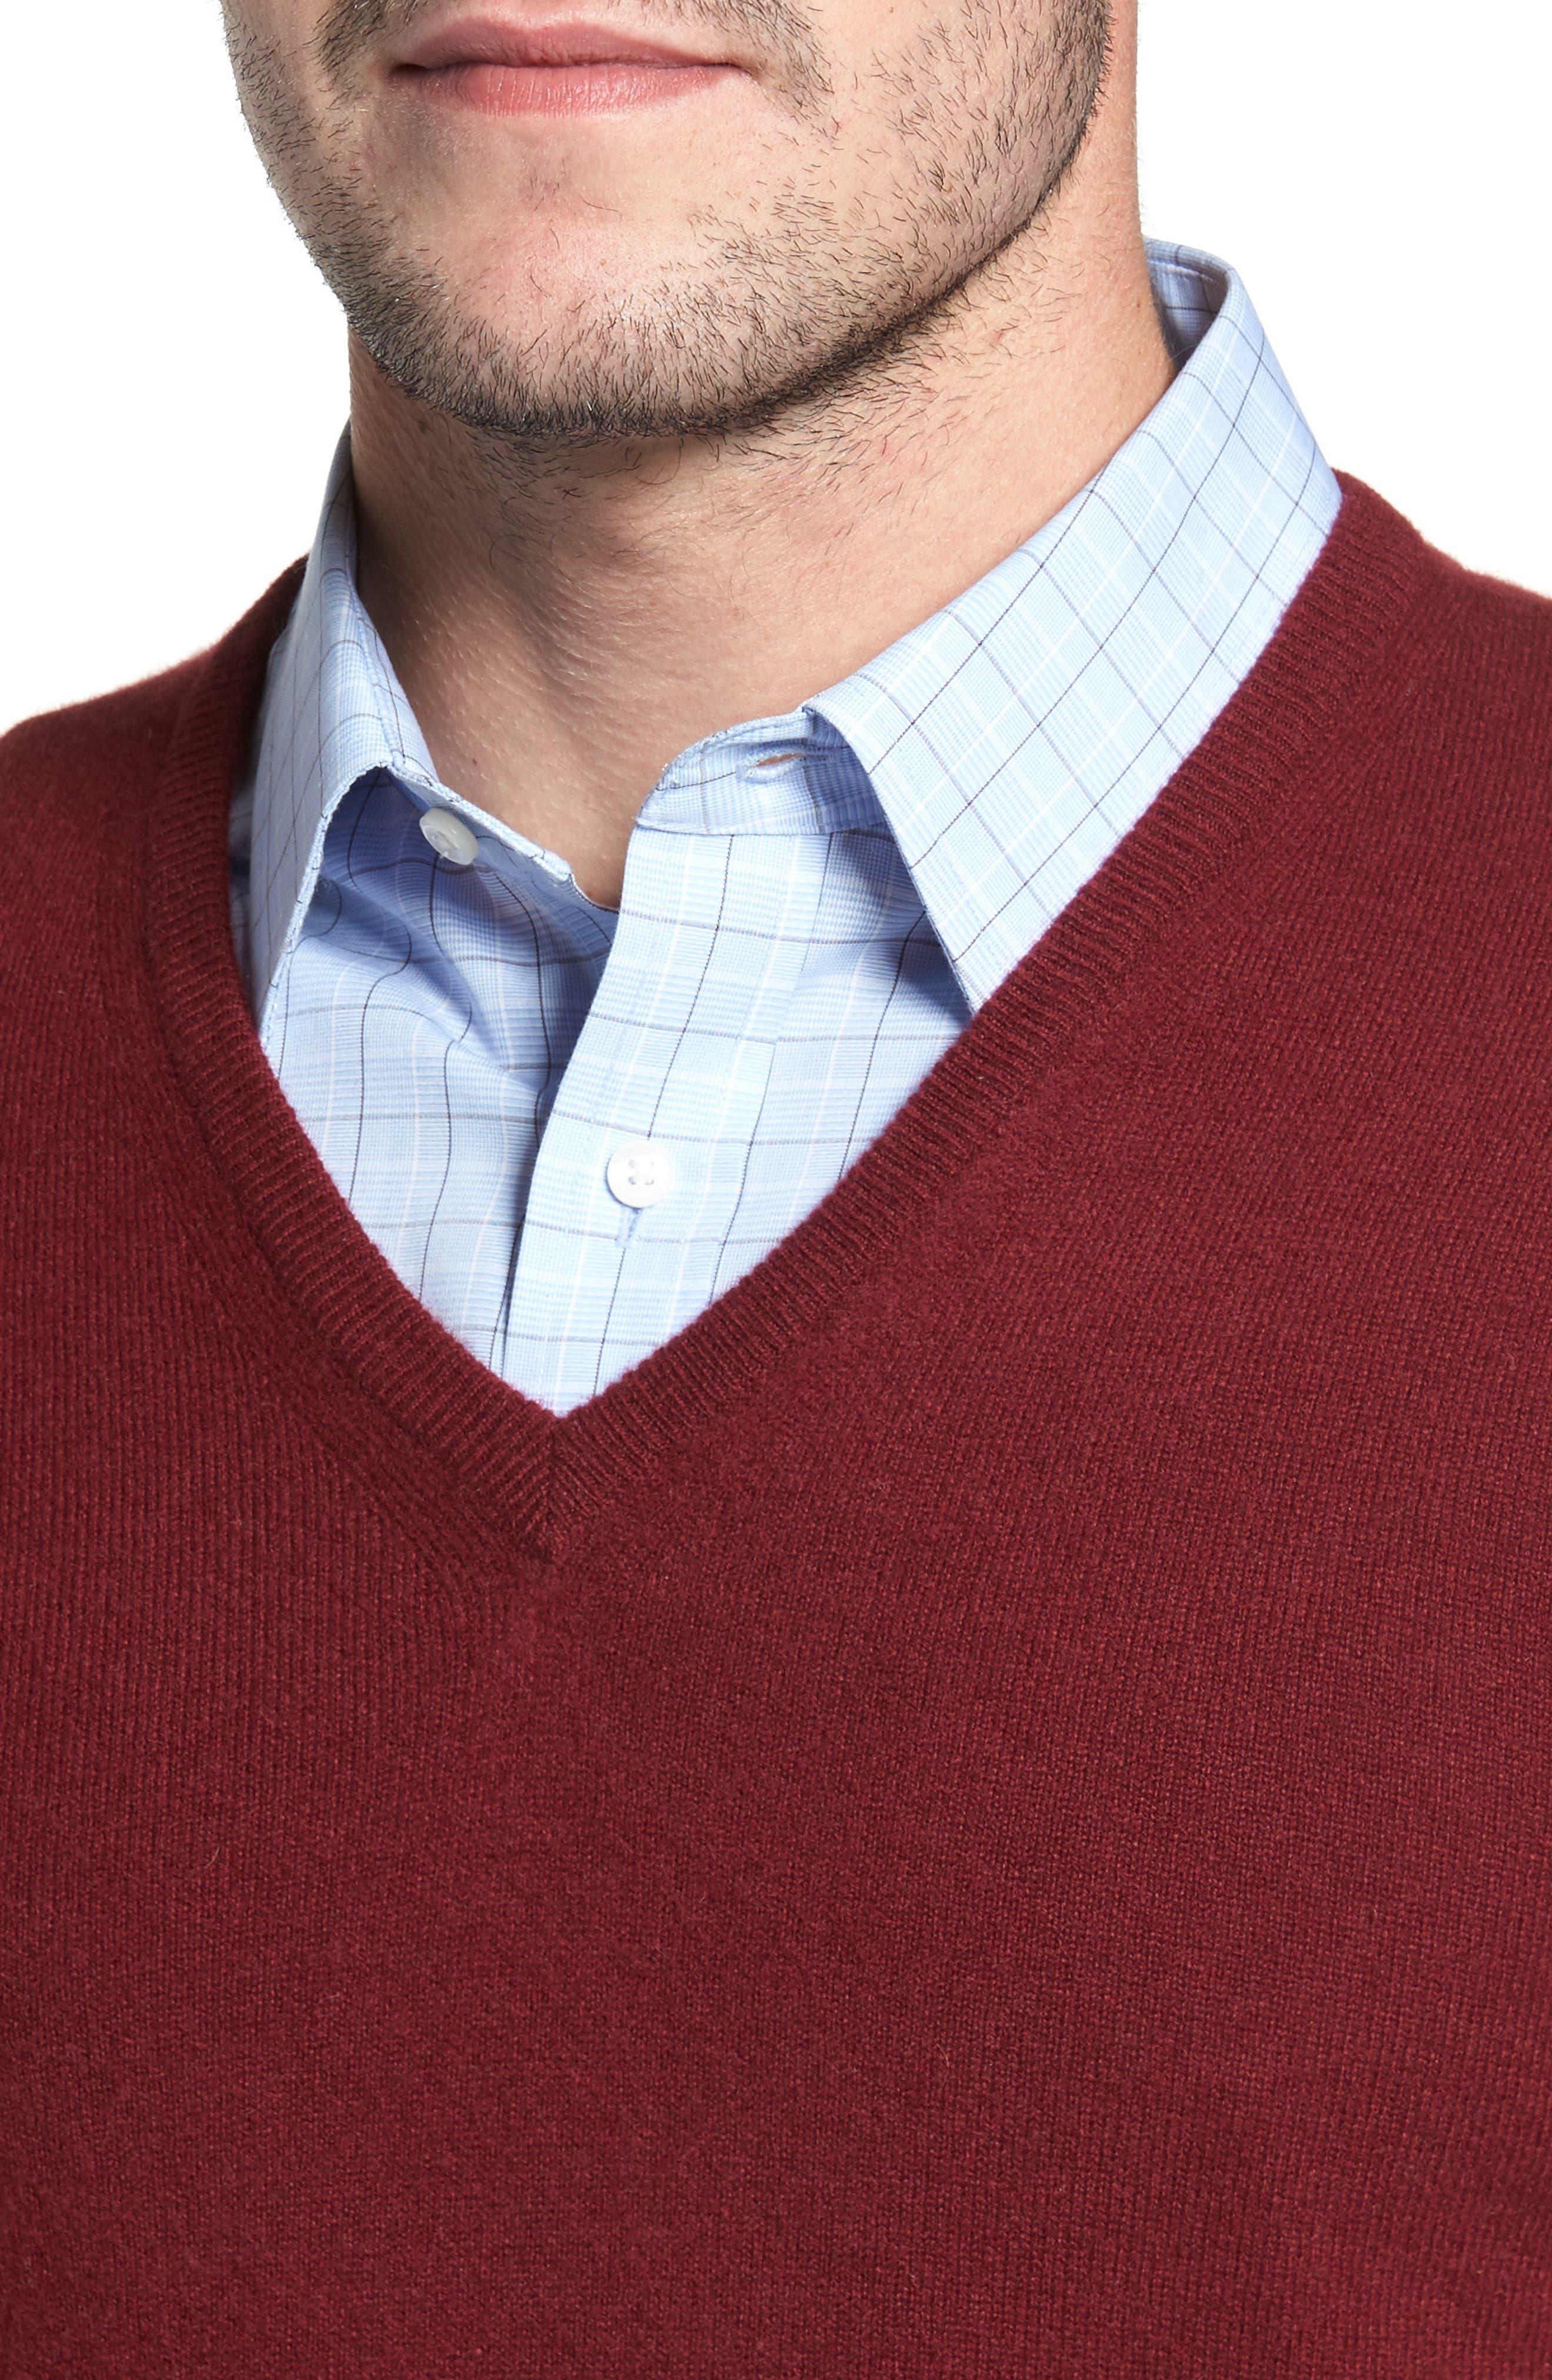 Cashmere V-Neck Sweater,                             Alternate thumbnail 24, color,